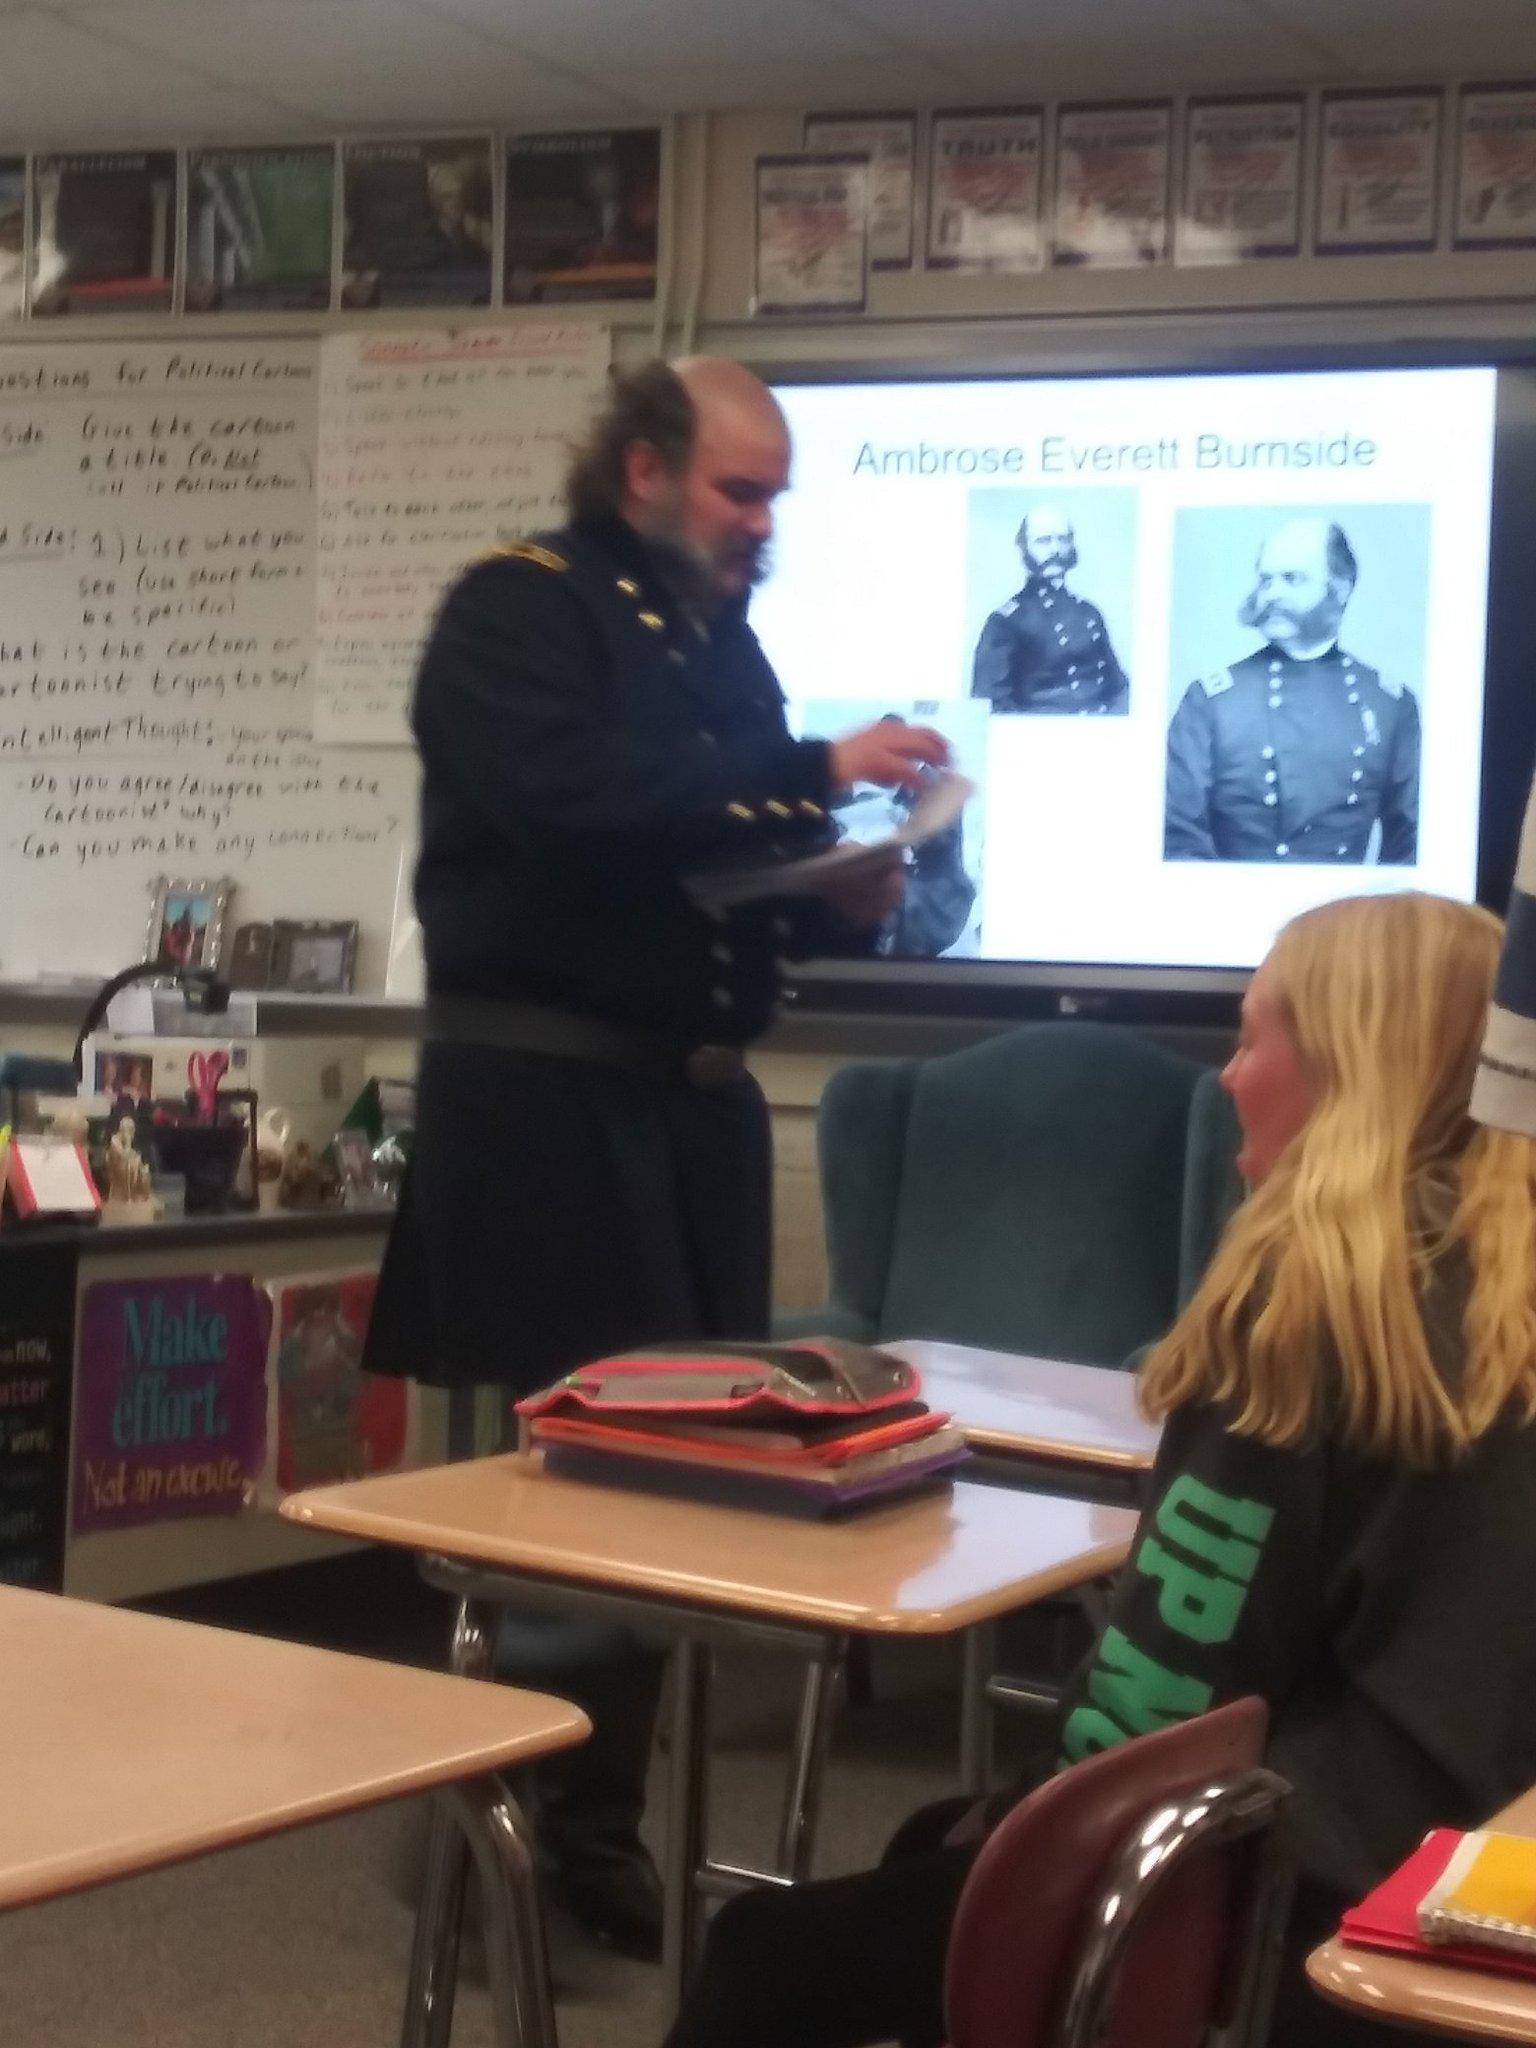 My history teacher from 7th grade... - meme